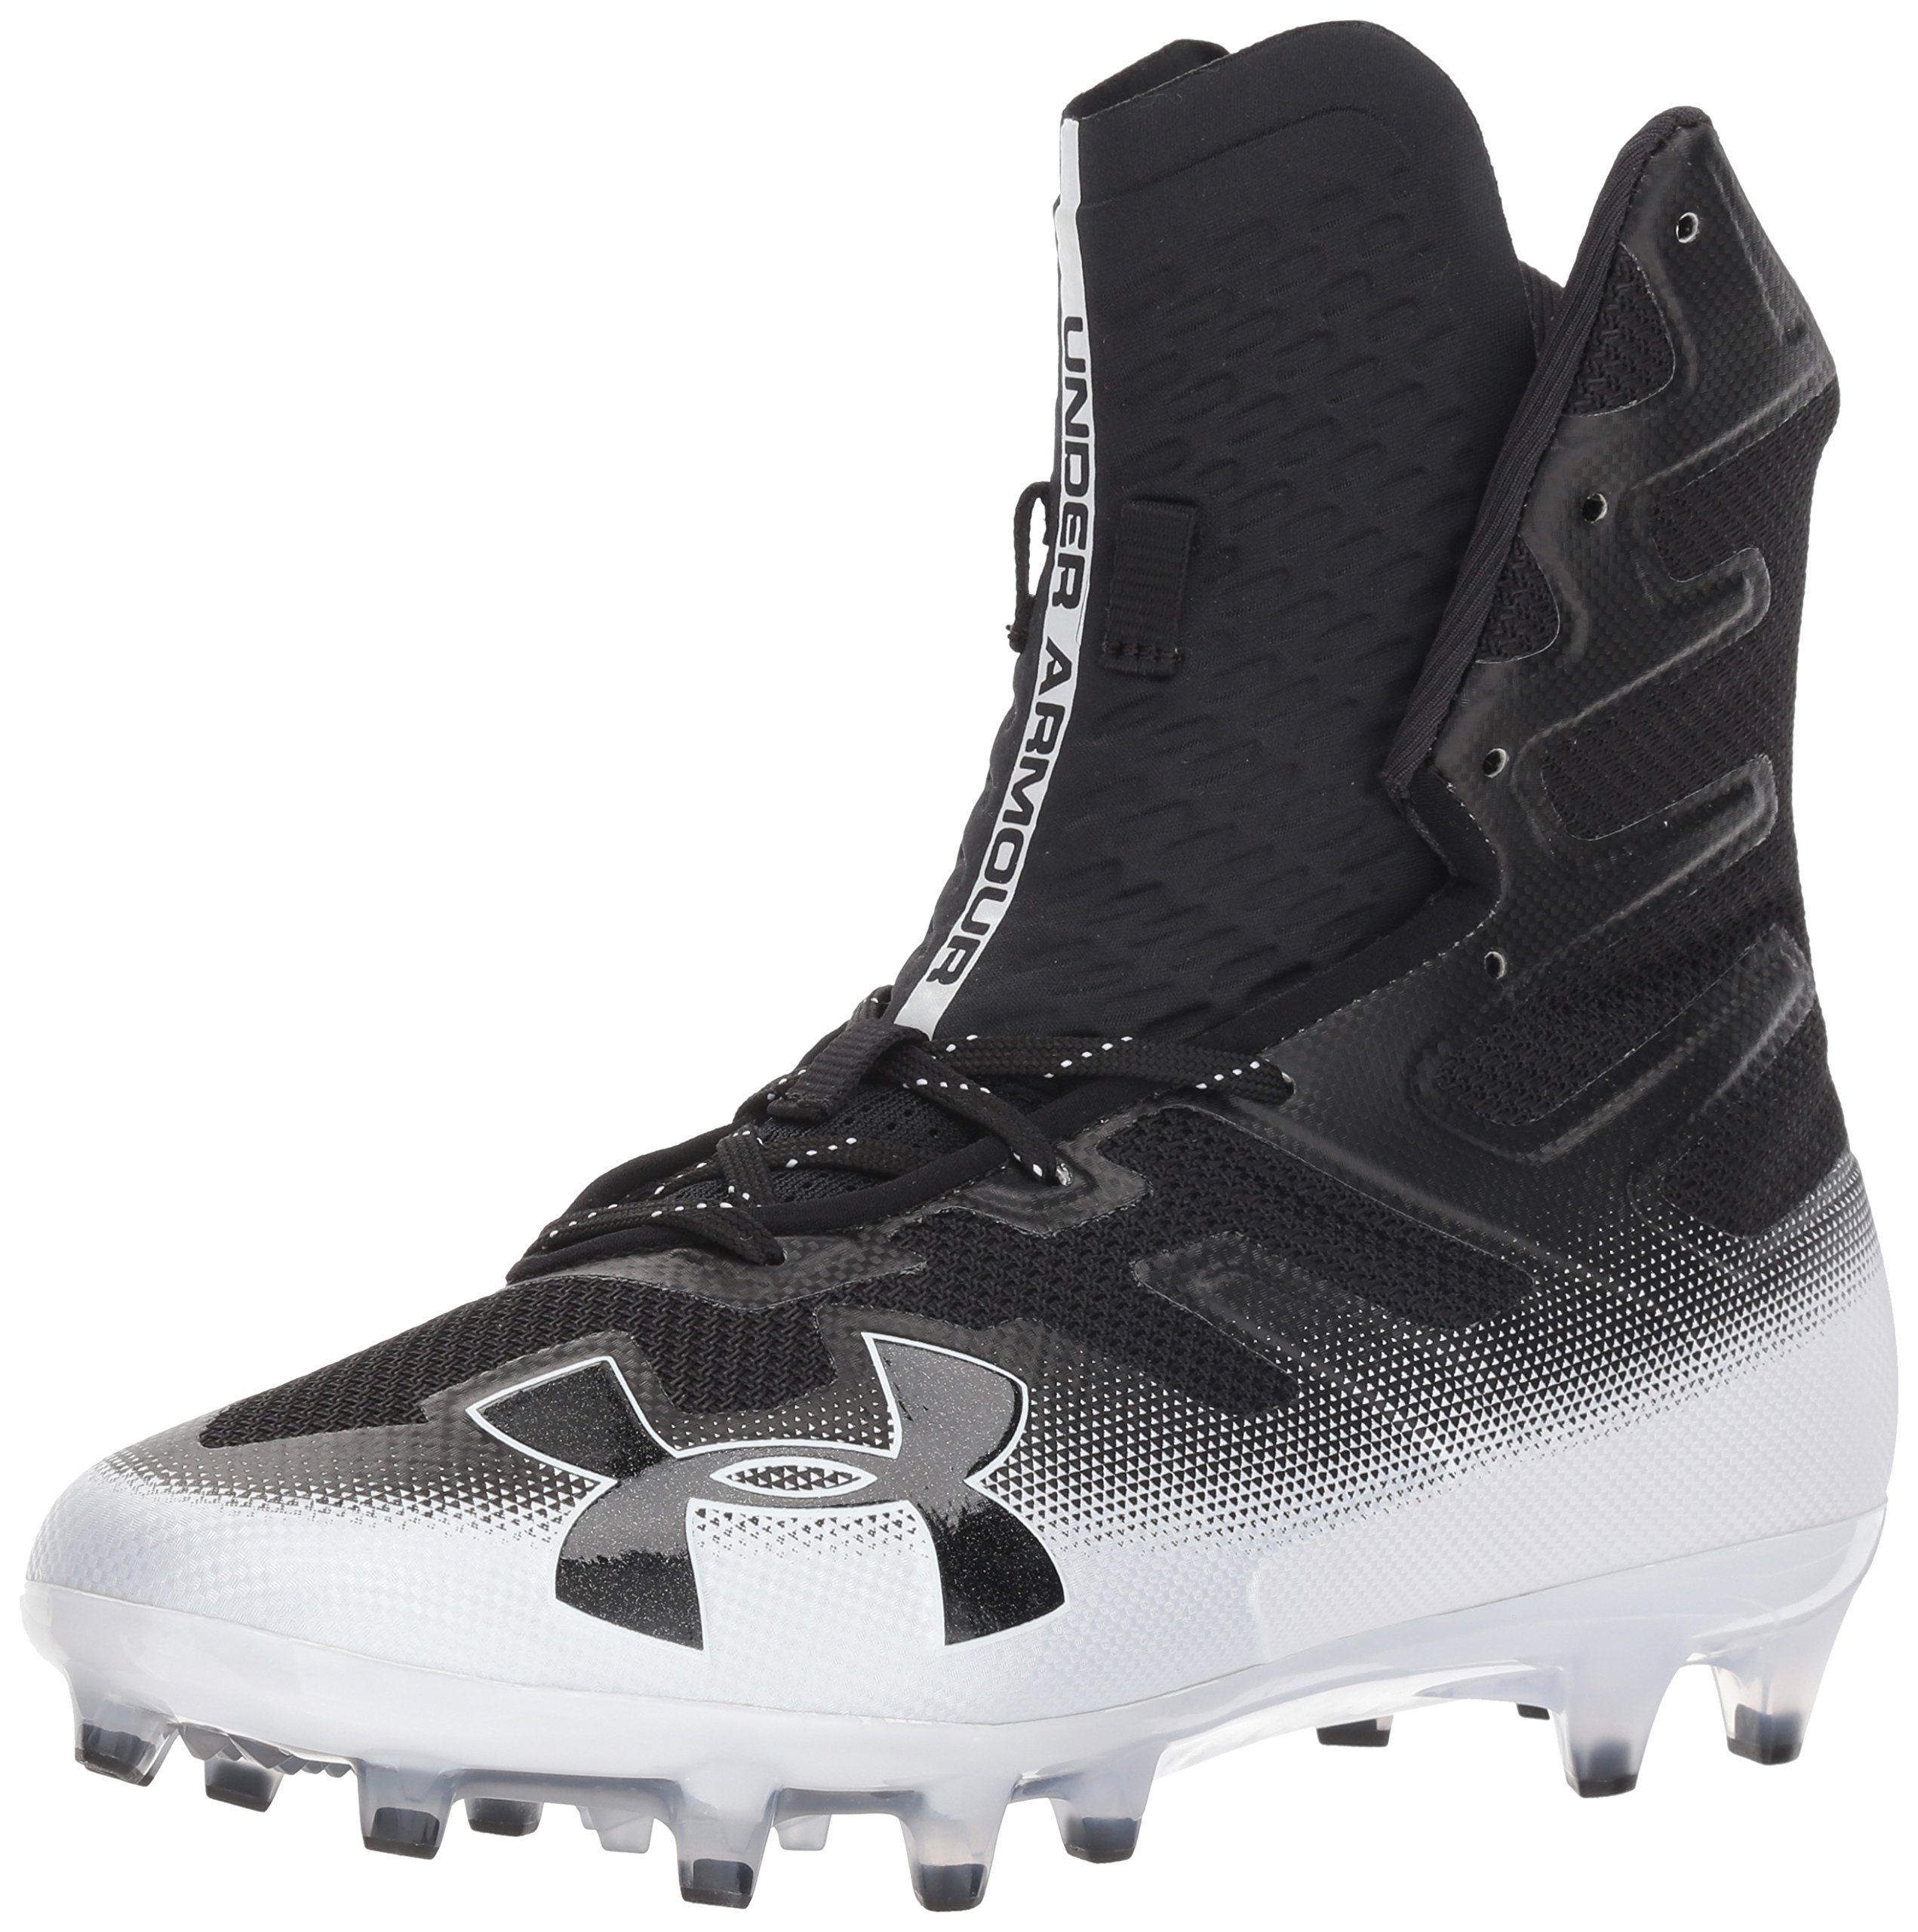 Under Armour Men's Highlight MC Football Shoe, Black (002)/White, 6.5